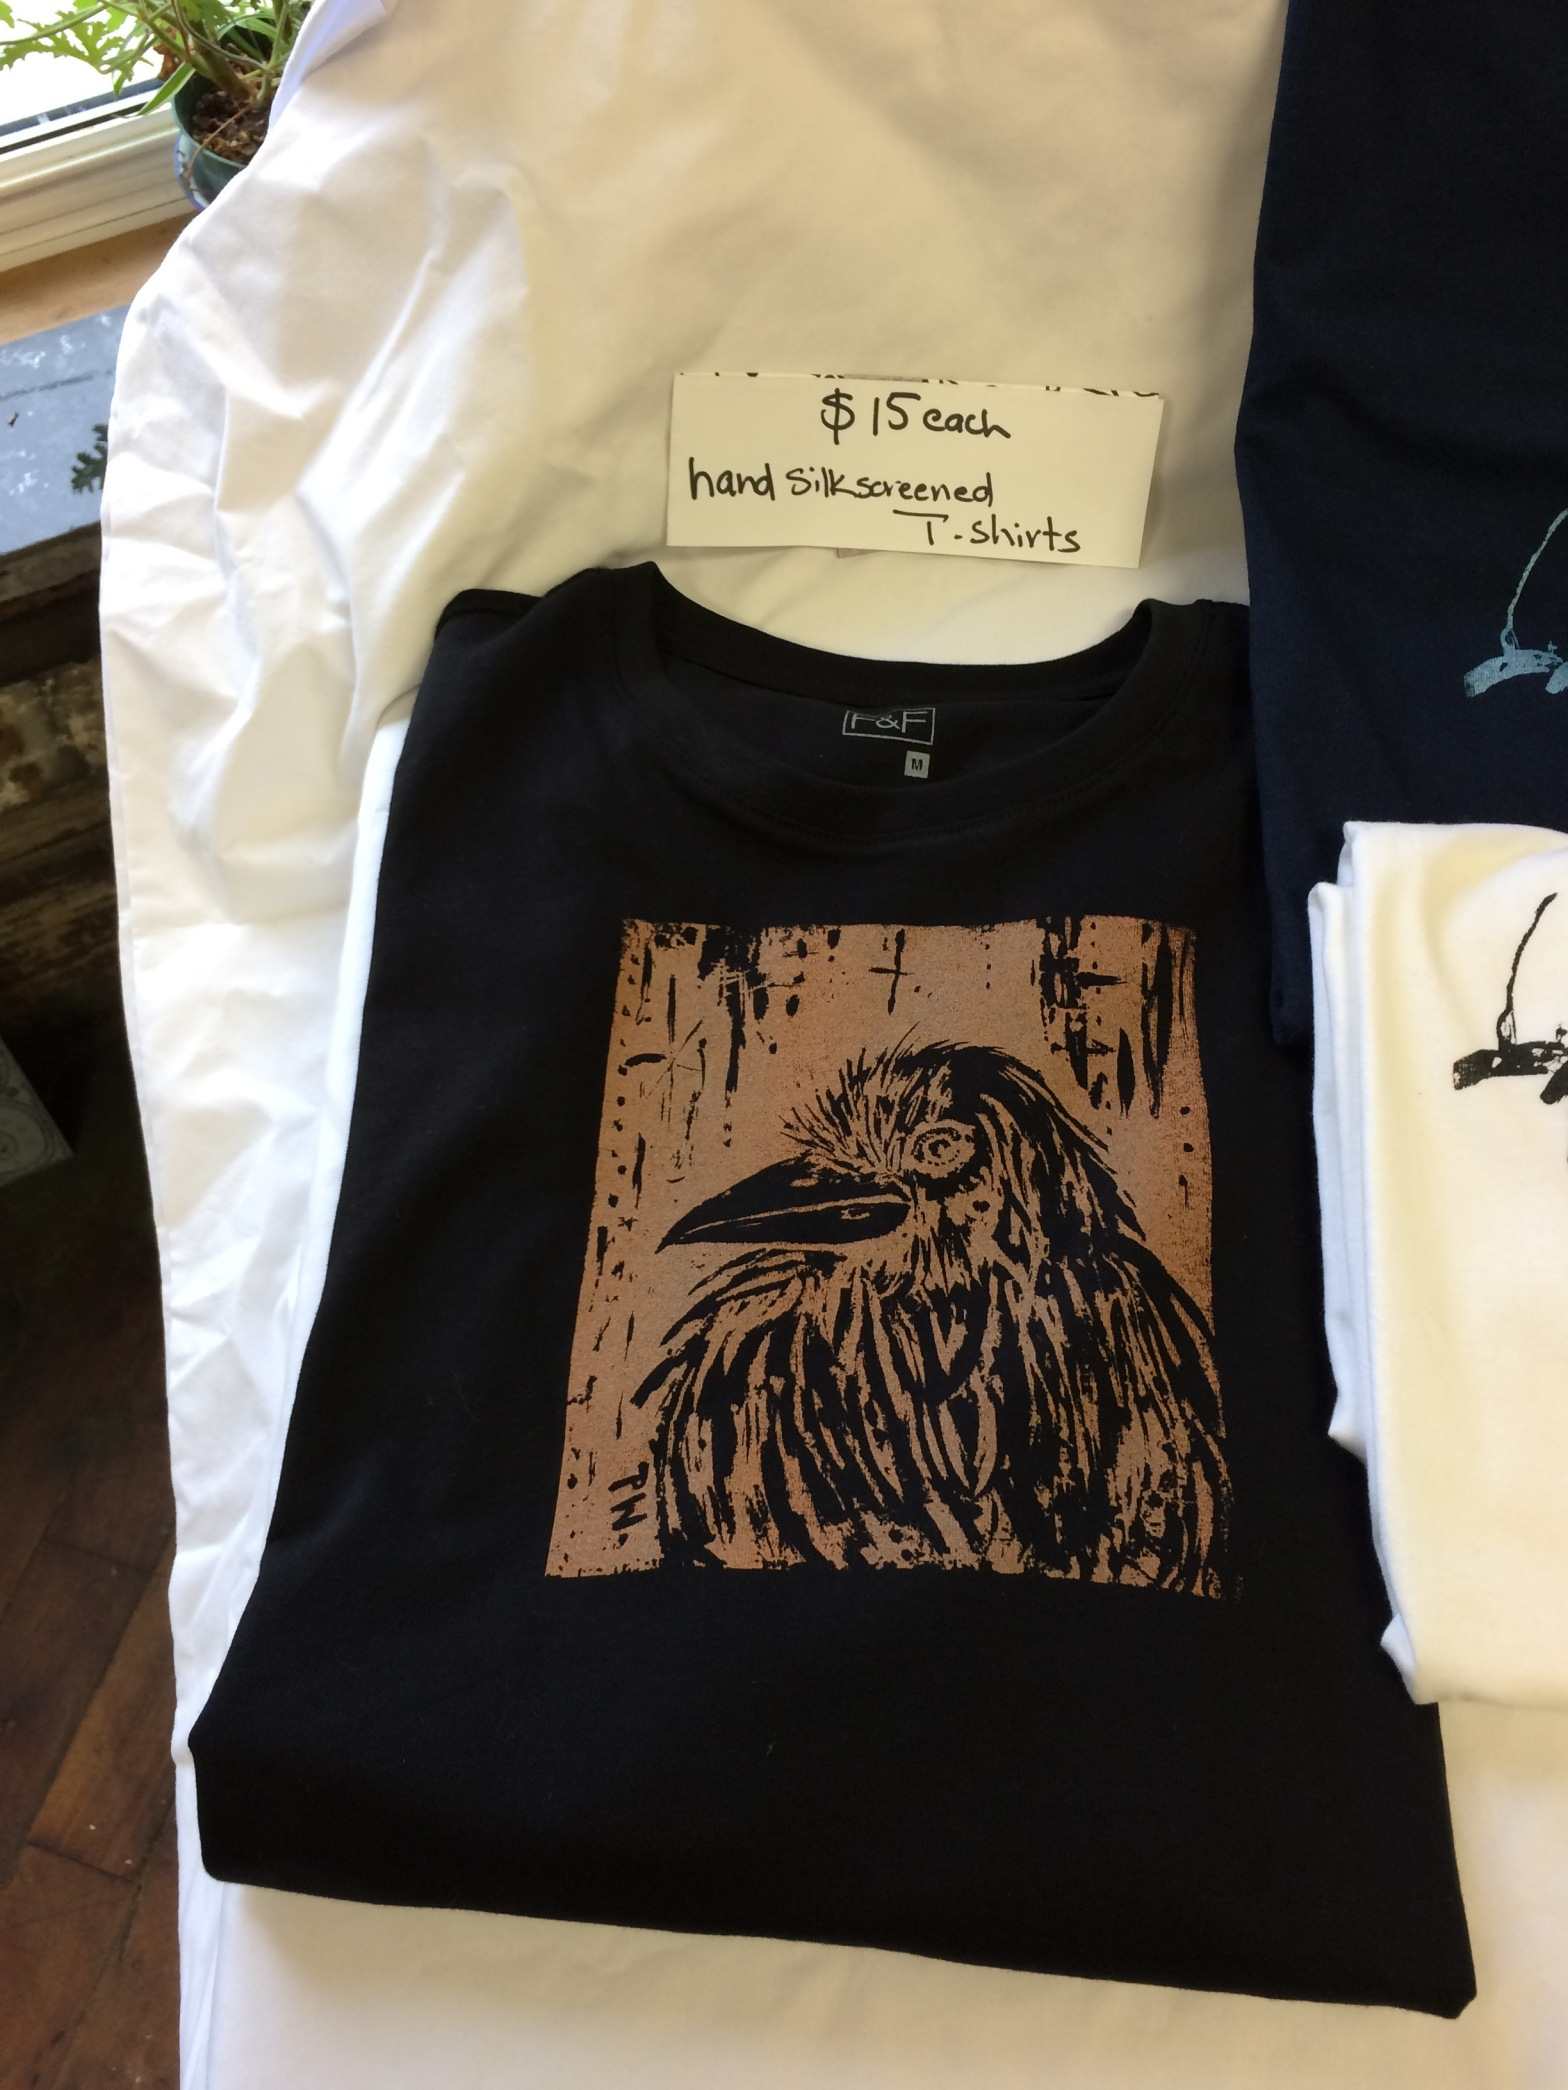 T-shirt, Raven motif, hand printed, silkscreened, original design